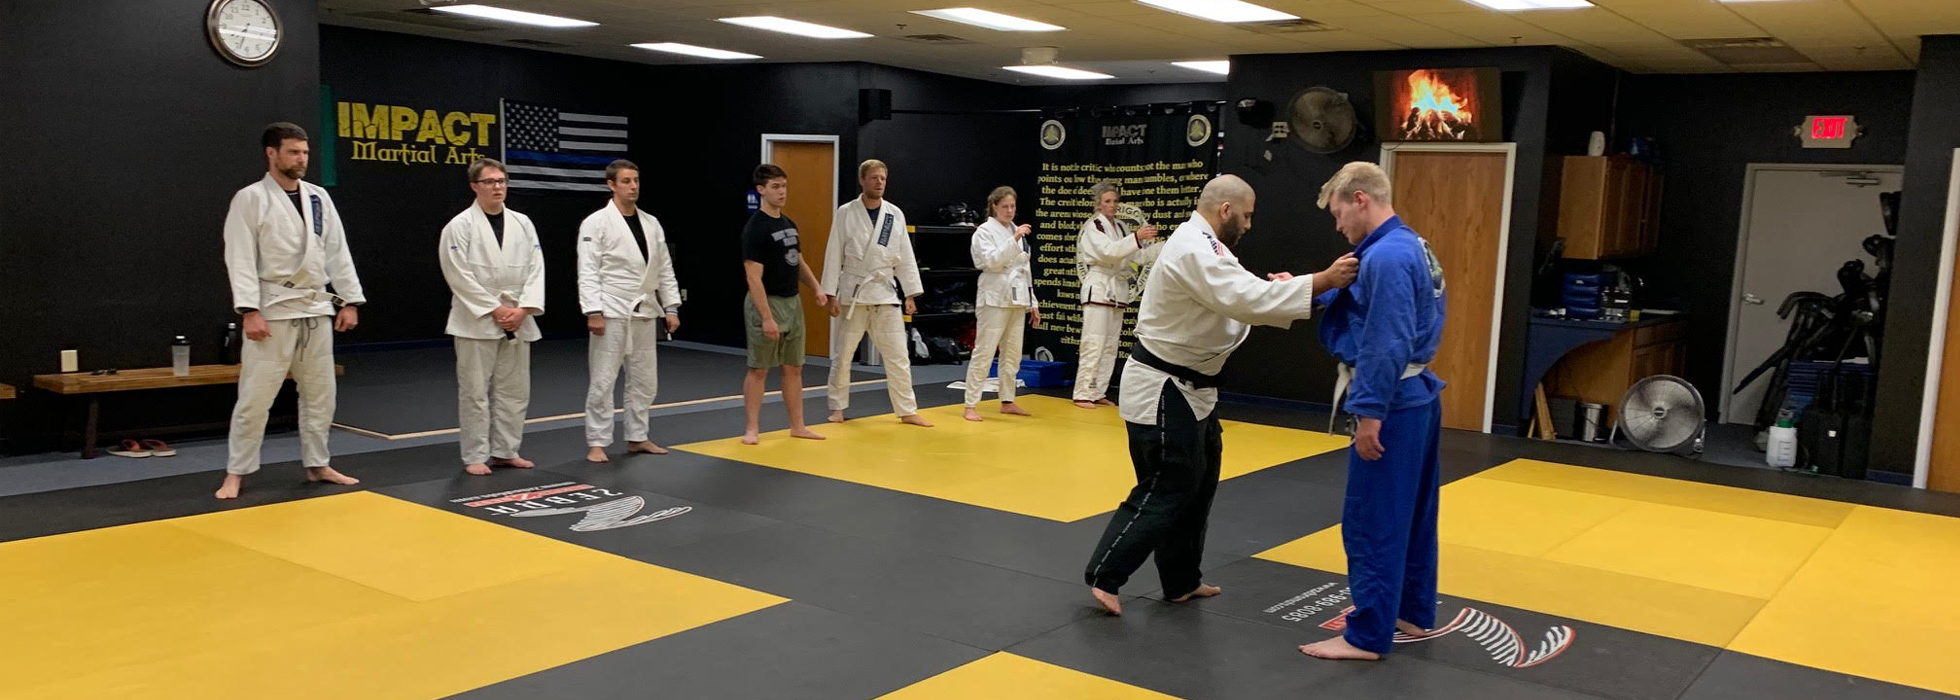 Judo Classes and Training in Oshkosh, WI close to Fox Cities